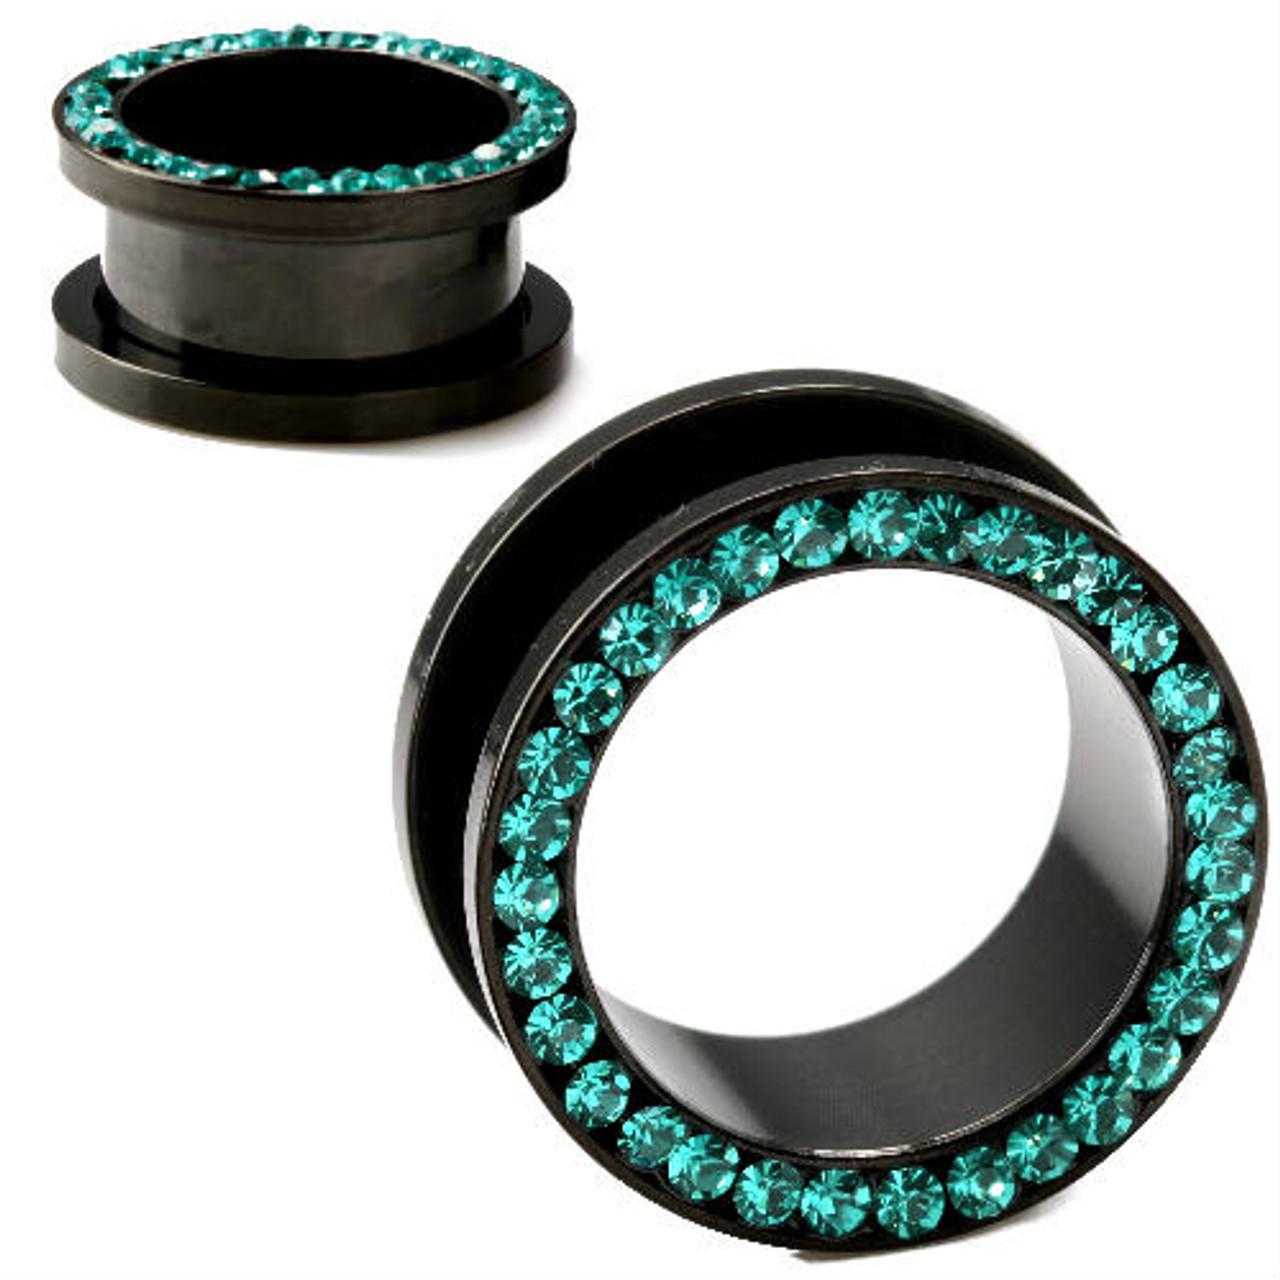 021fd79c1 Black Titanium Screw Back Ear Tunnels With TEAL CZ Gems - So Scene